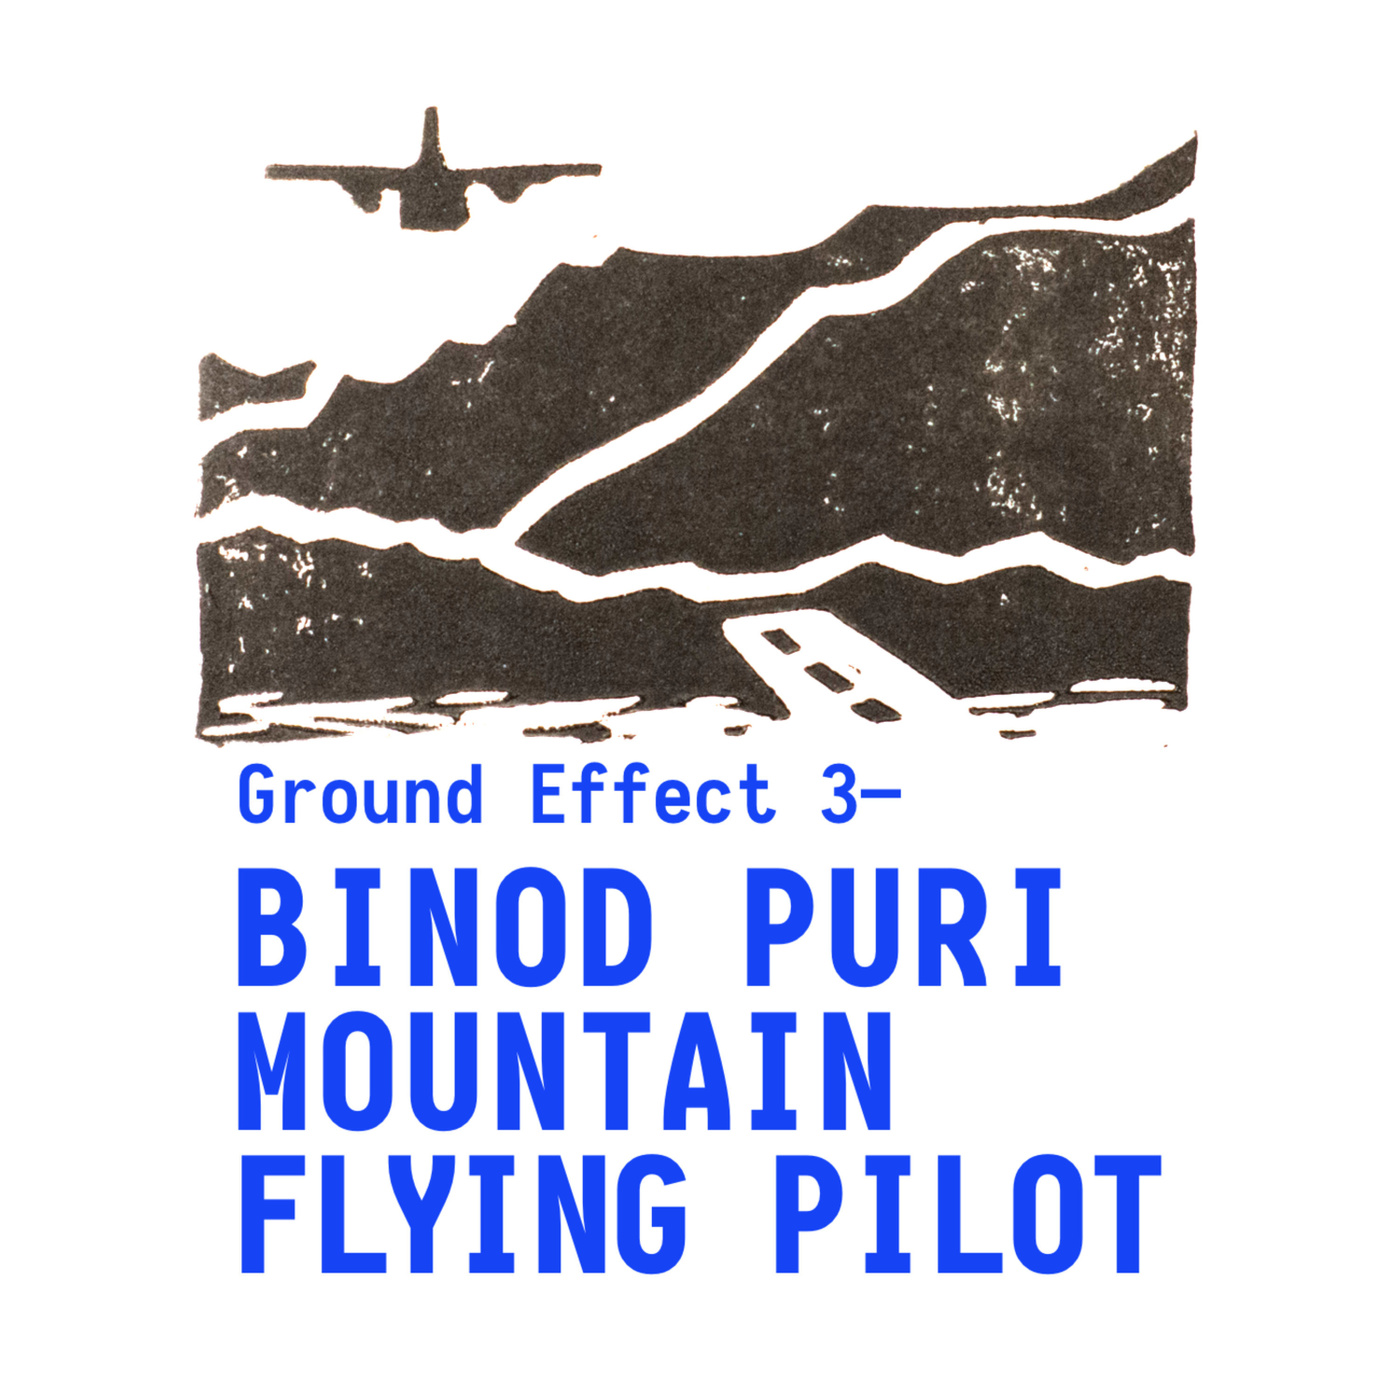 3. Binod Puri, Nepalese Mountain Flying Pilot